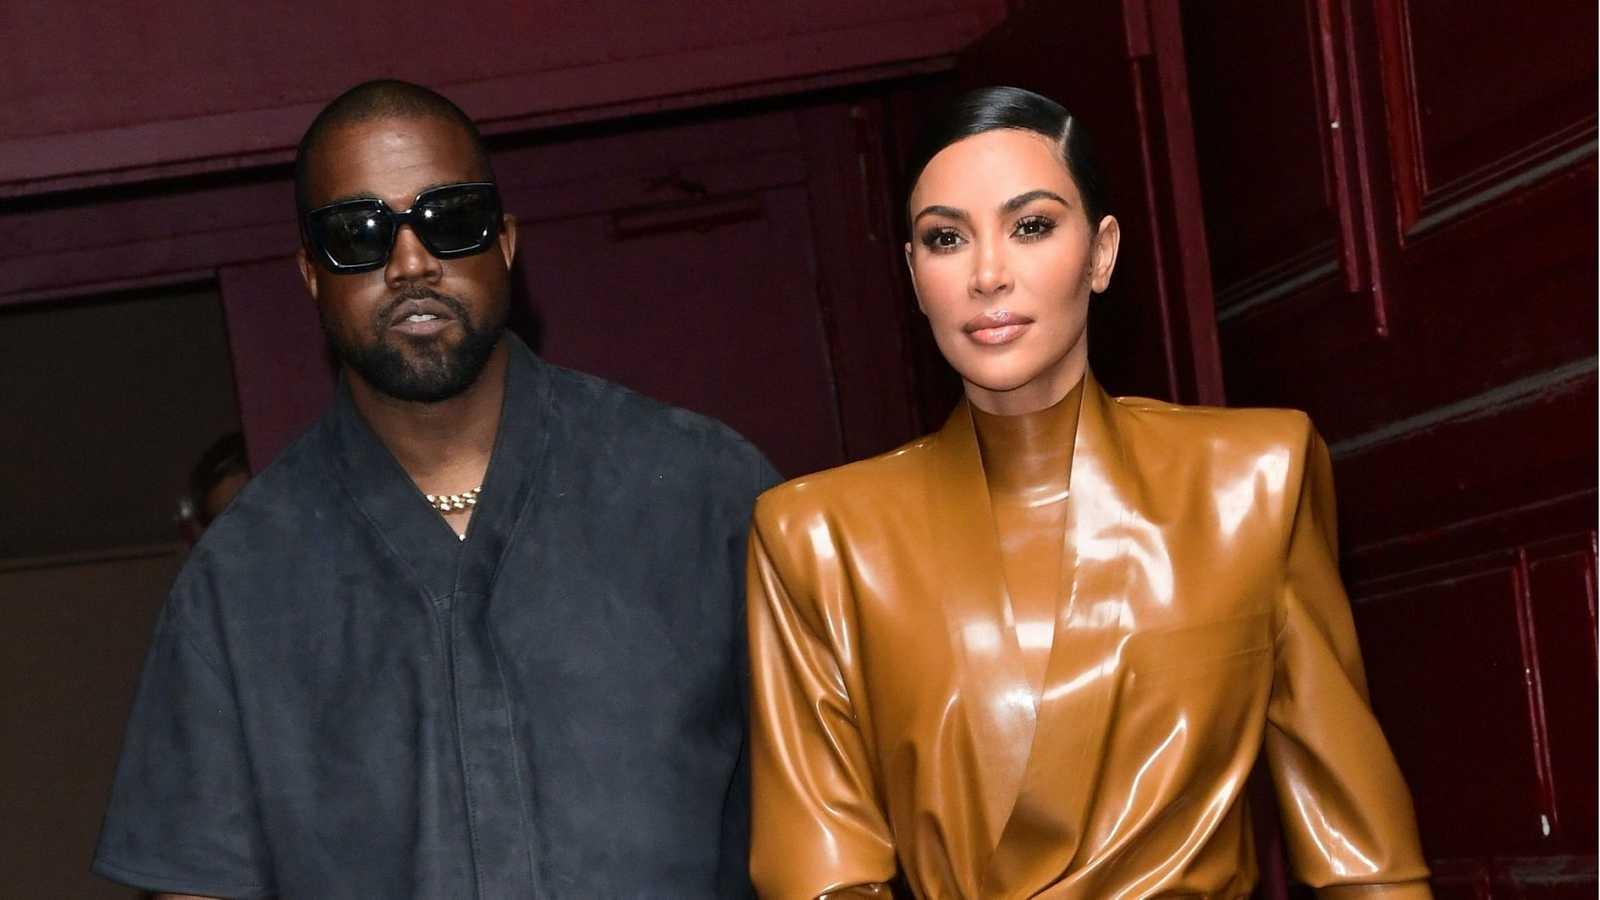 Kanye West y Kim Kardashian; Kim Kardashian debuta en 'SNL' con un irreverente monologo que puso a reír a internet